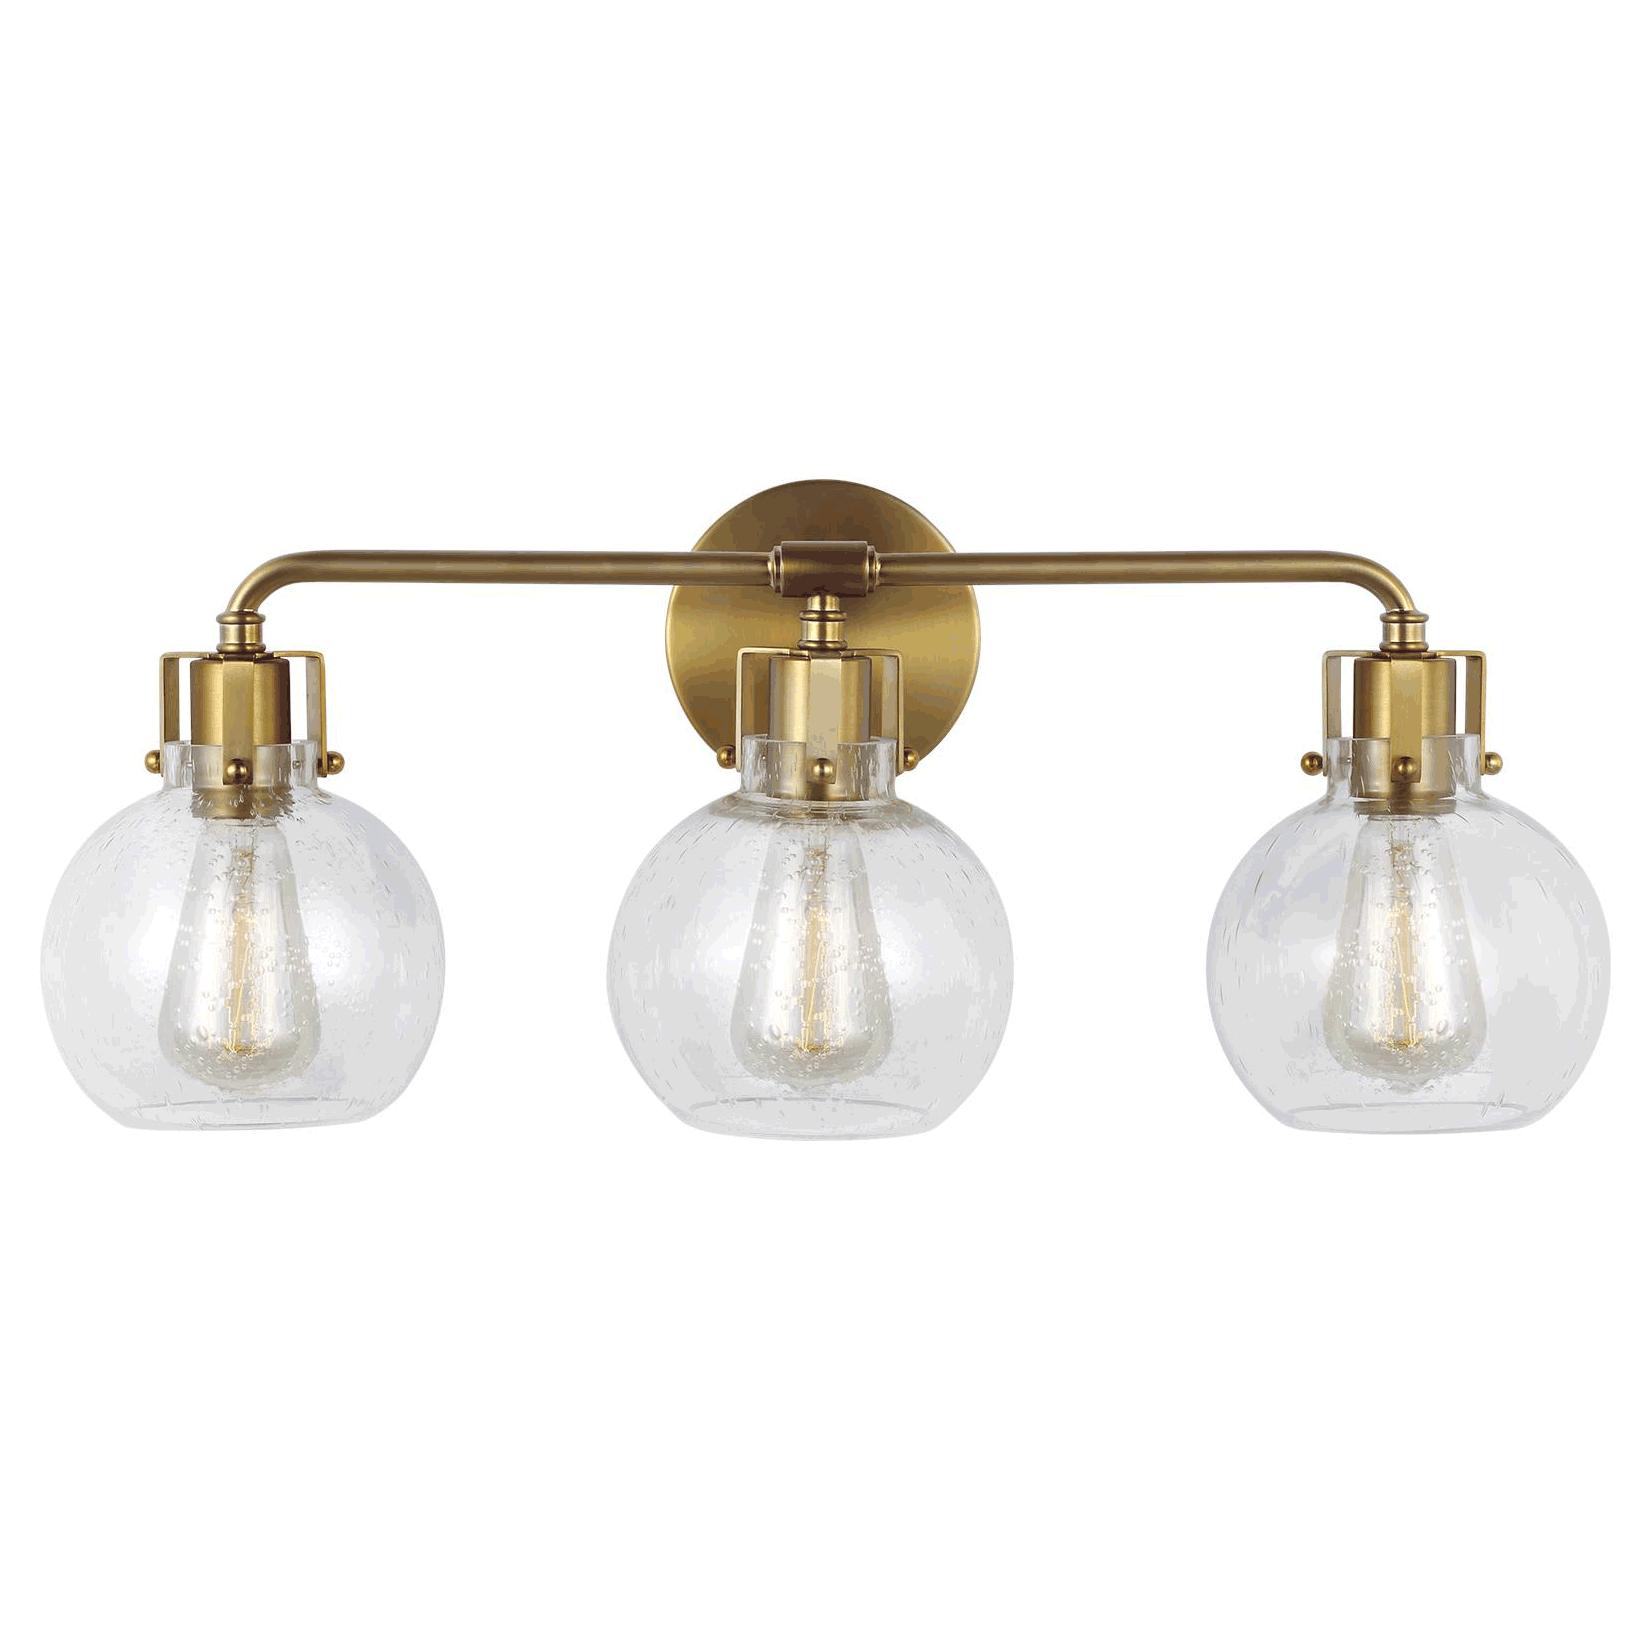 huge discount 76b15 d1320 Clara Brass Bathroom Vanity Light by Feiss | VS24403BBS